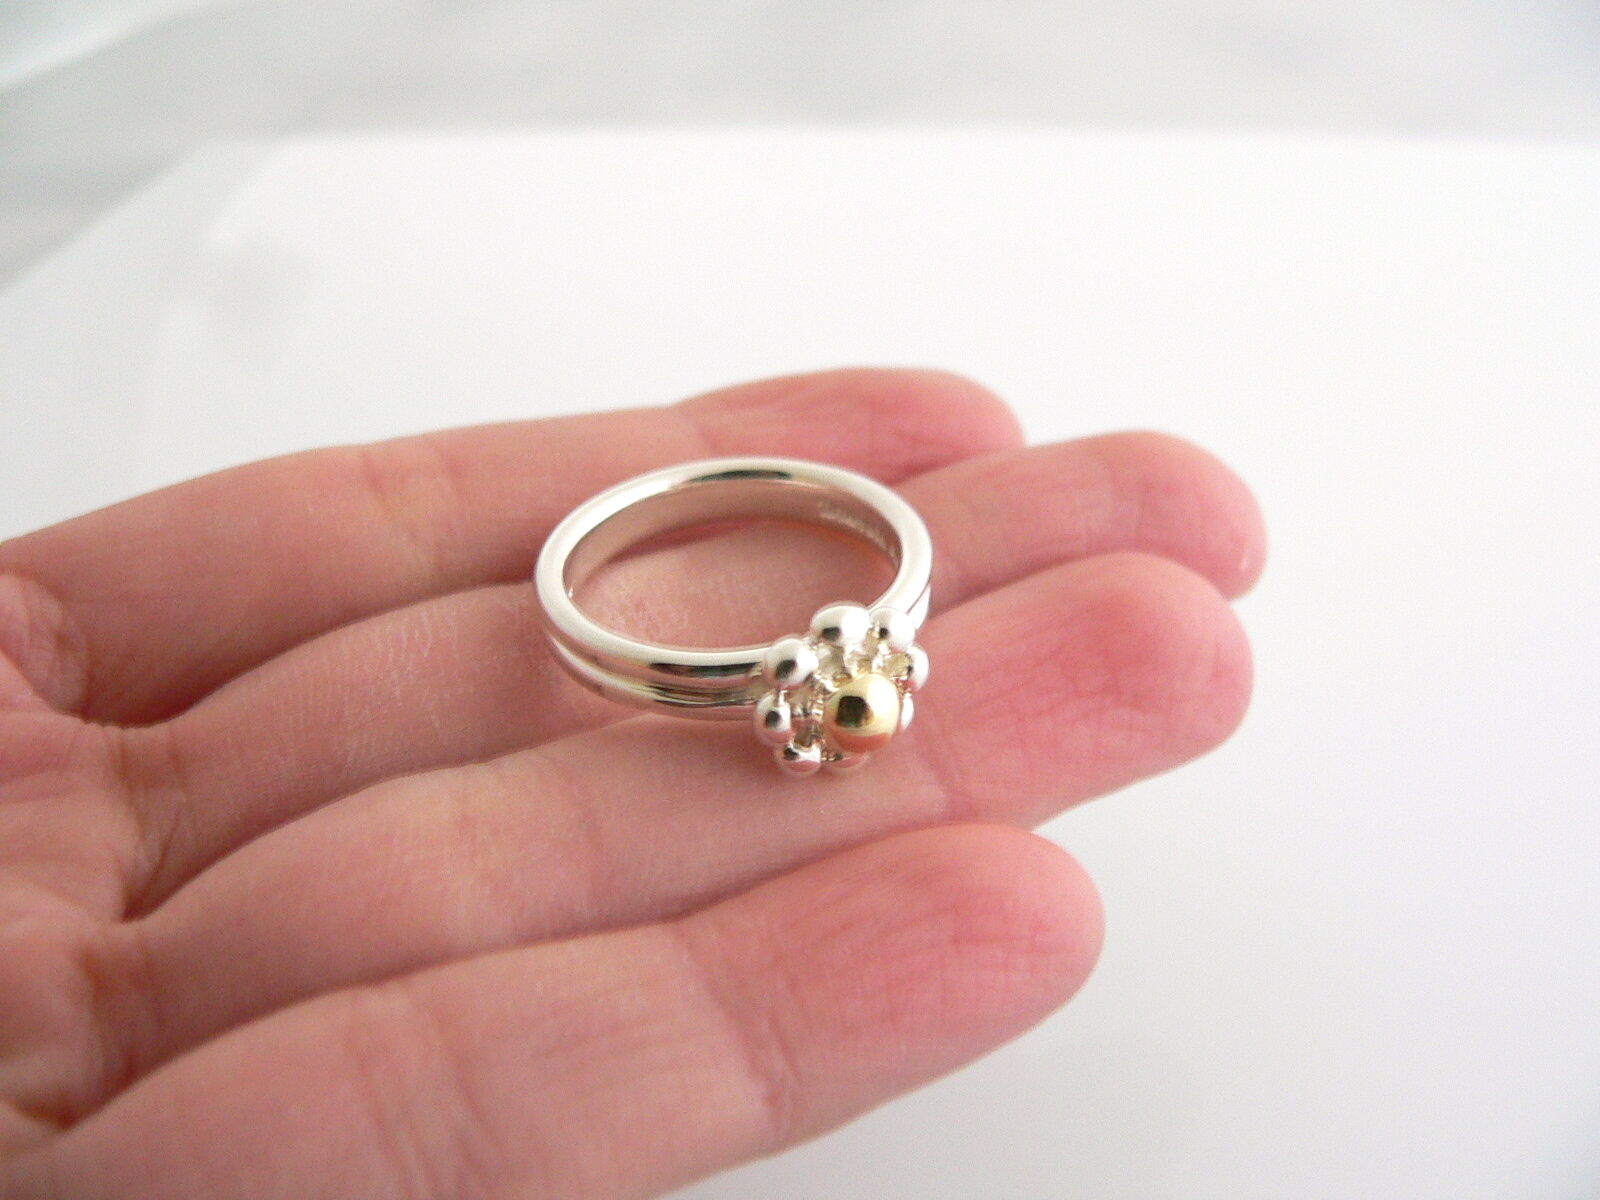 3712b58cc4fb3 Tiffany & Co Silver 18K Gold Picasso Jolie Flower Bead RIng Band Sz ...